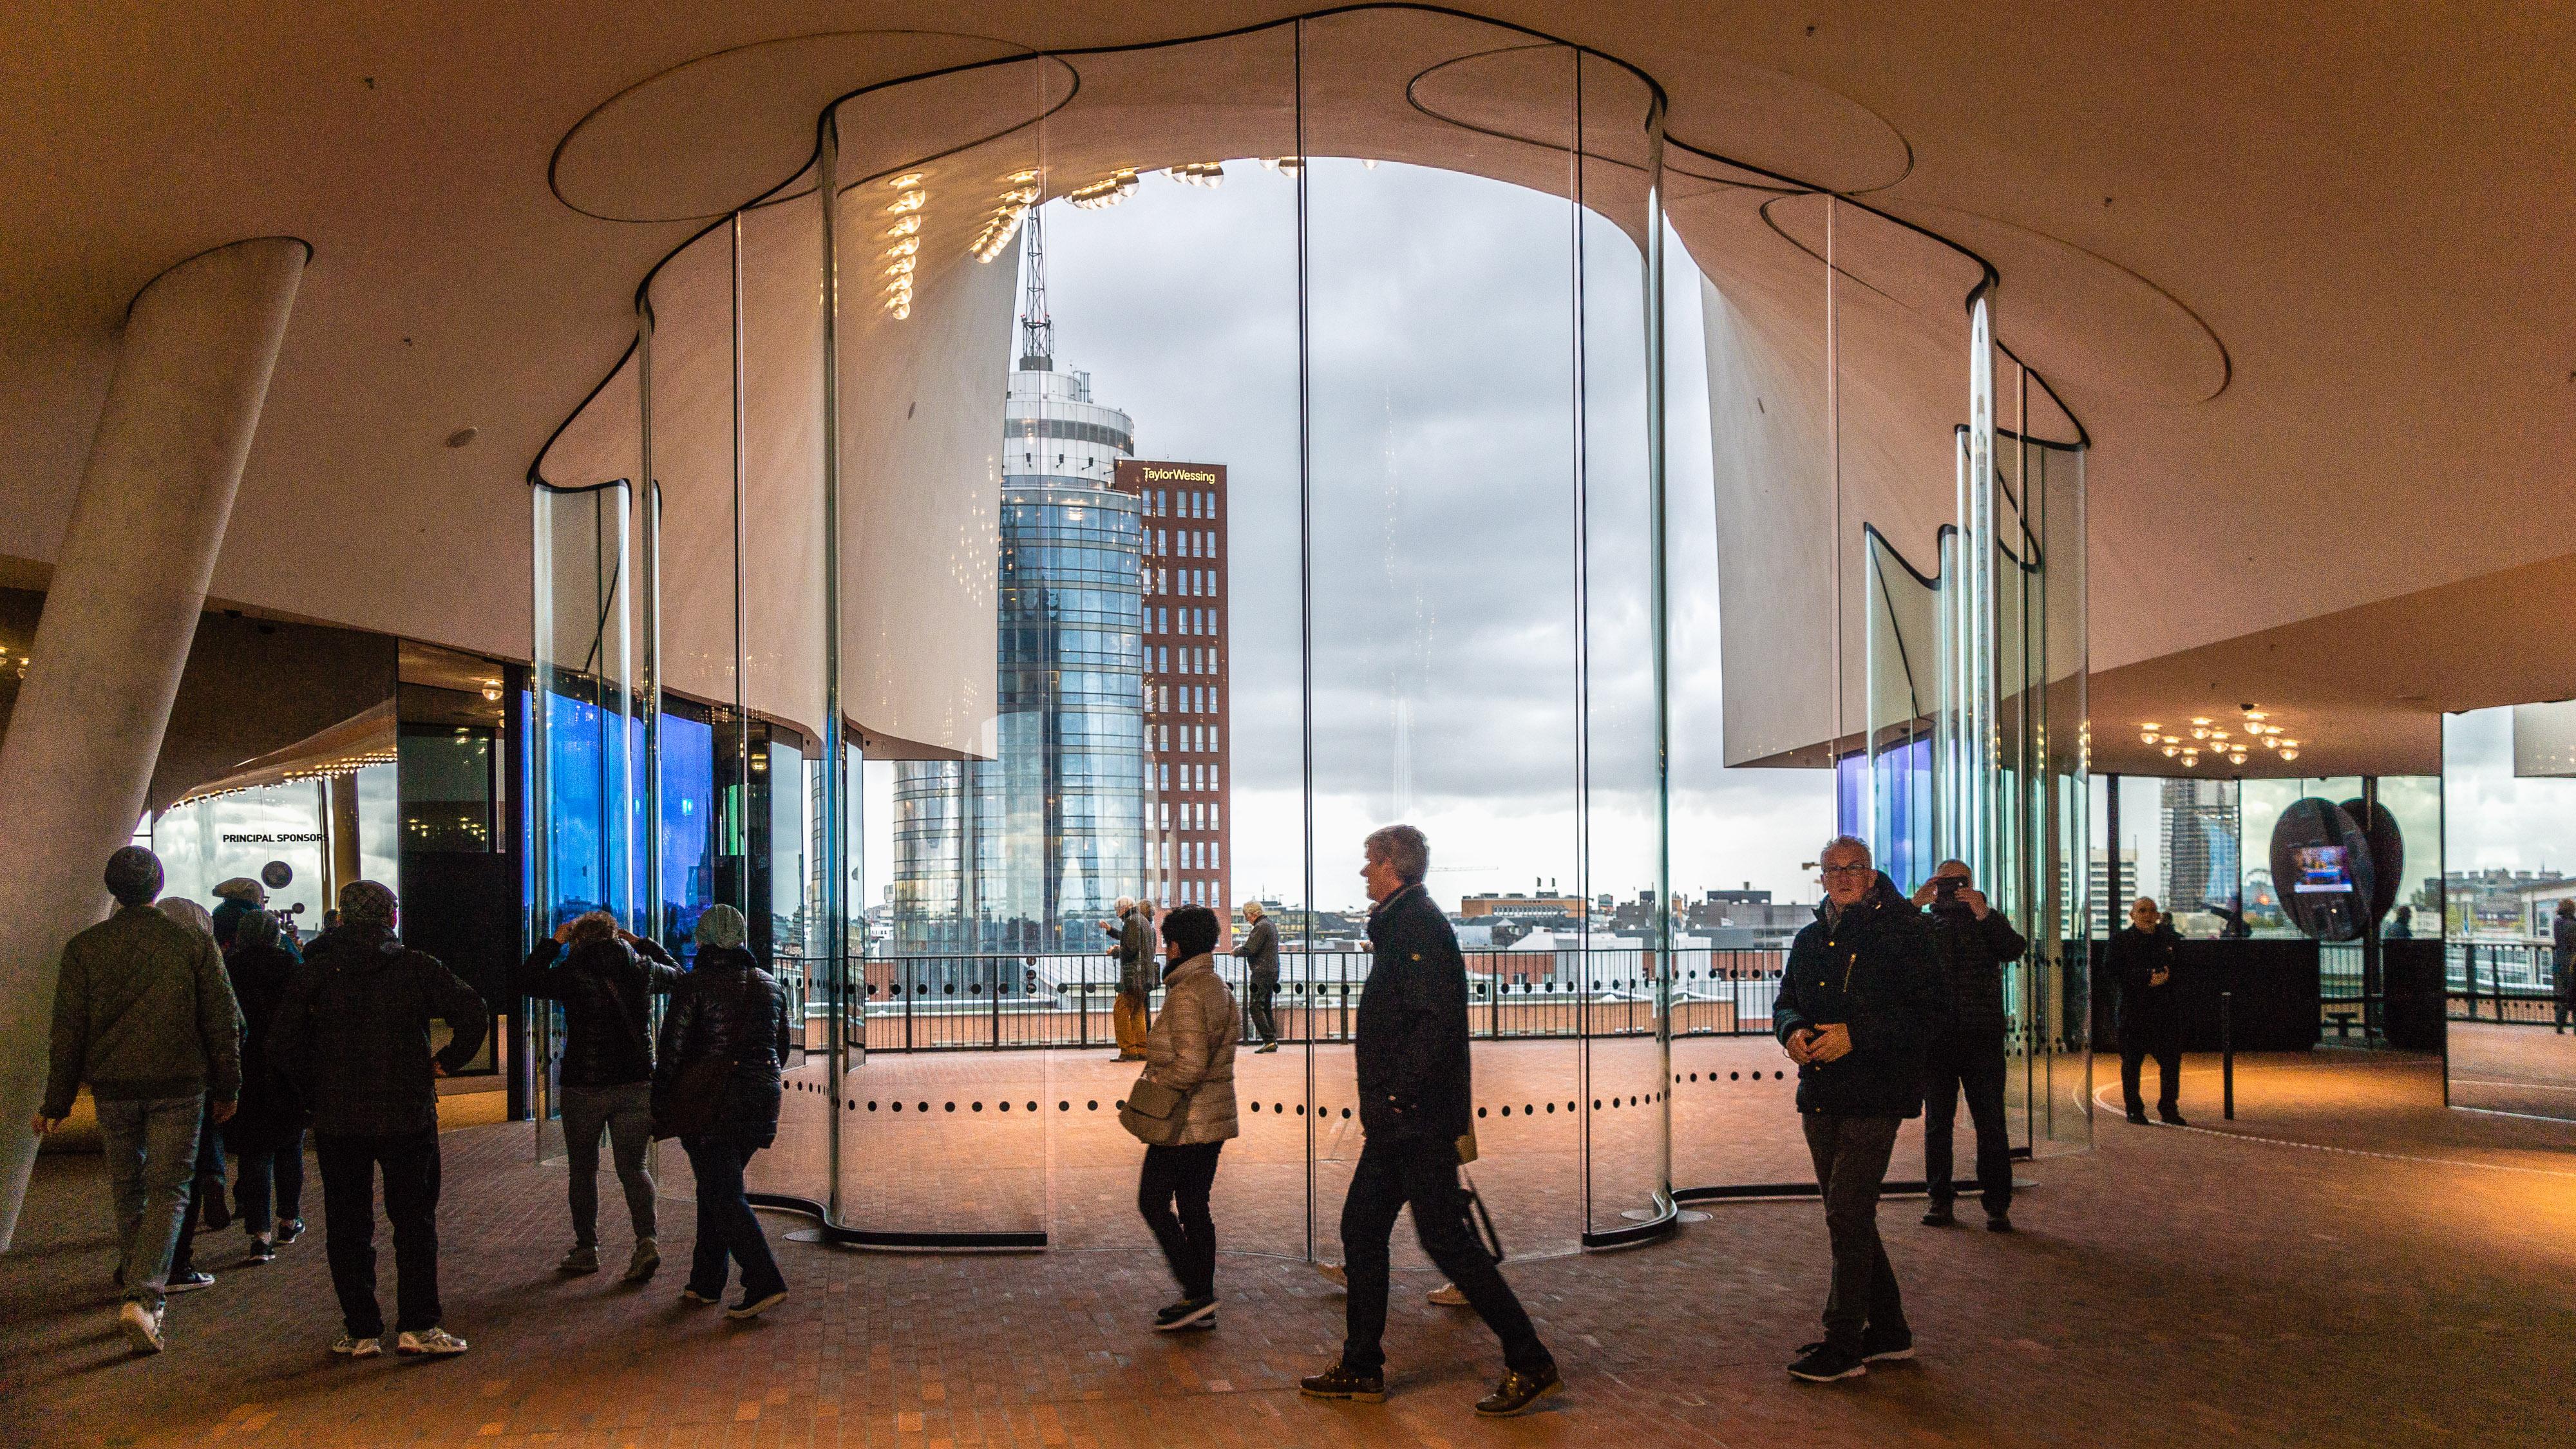 Uitkijkpunten in Hamburg, Elbphilharmonie | foto door Wilfried Schnetzler | Standort Hamburg